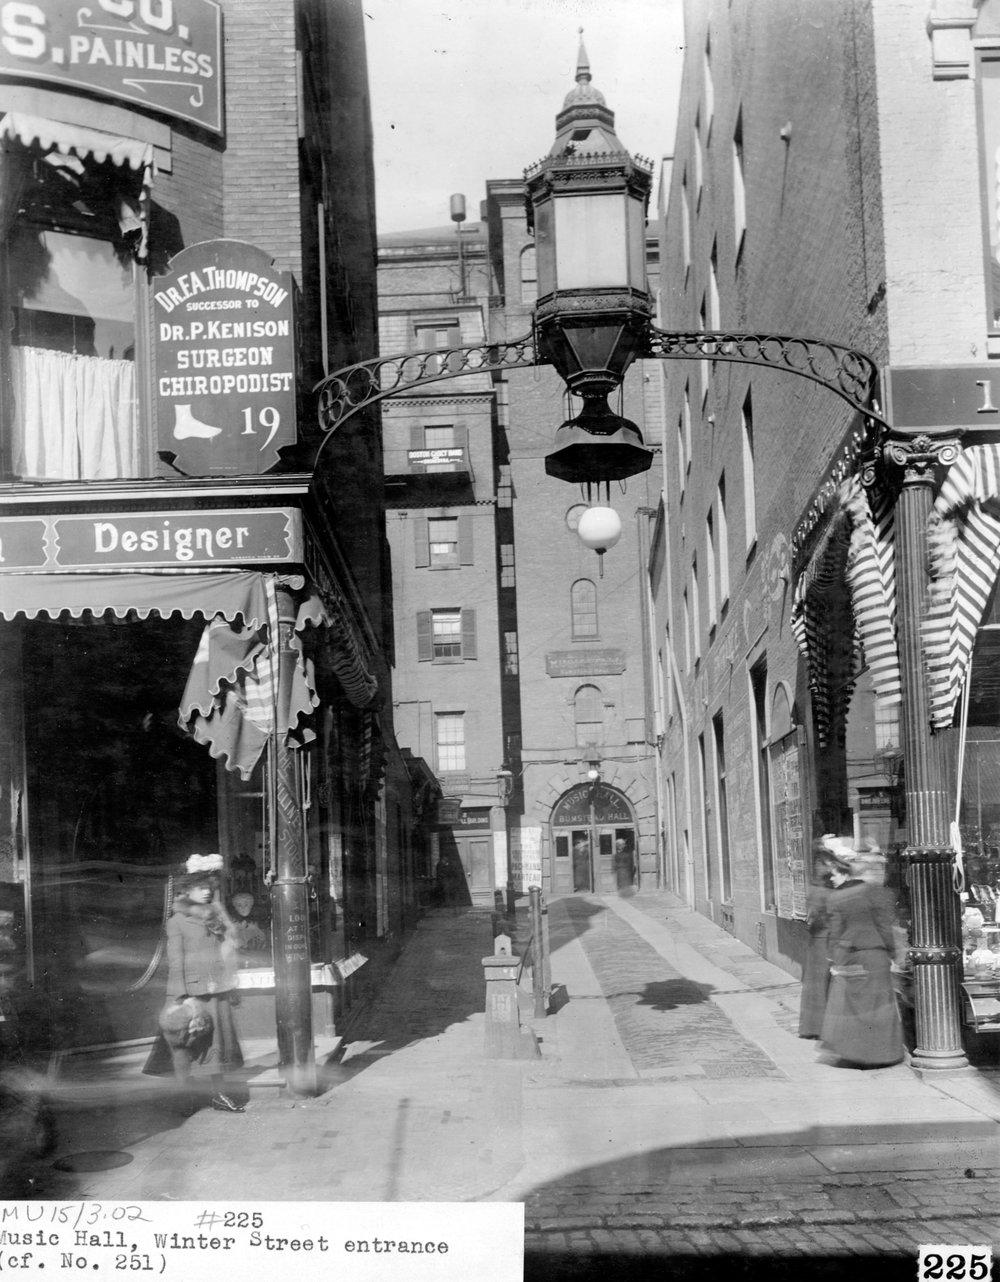 Boston Music Hall, Winter Street Entrance